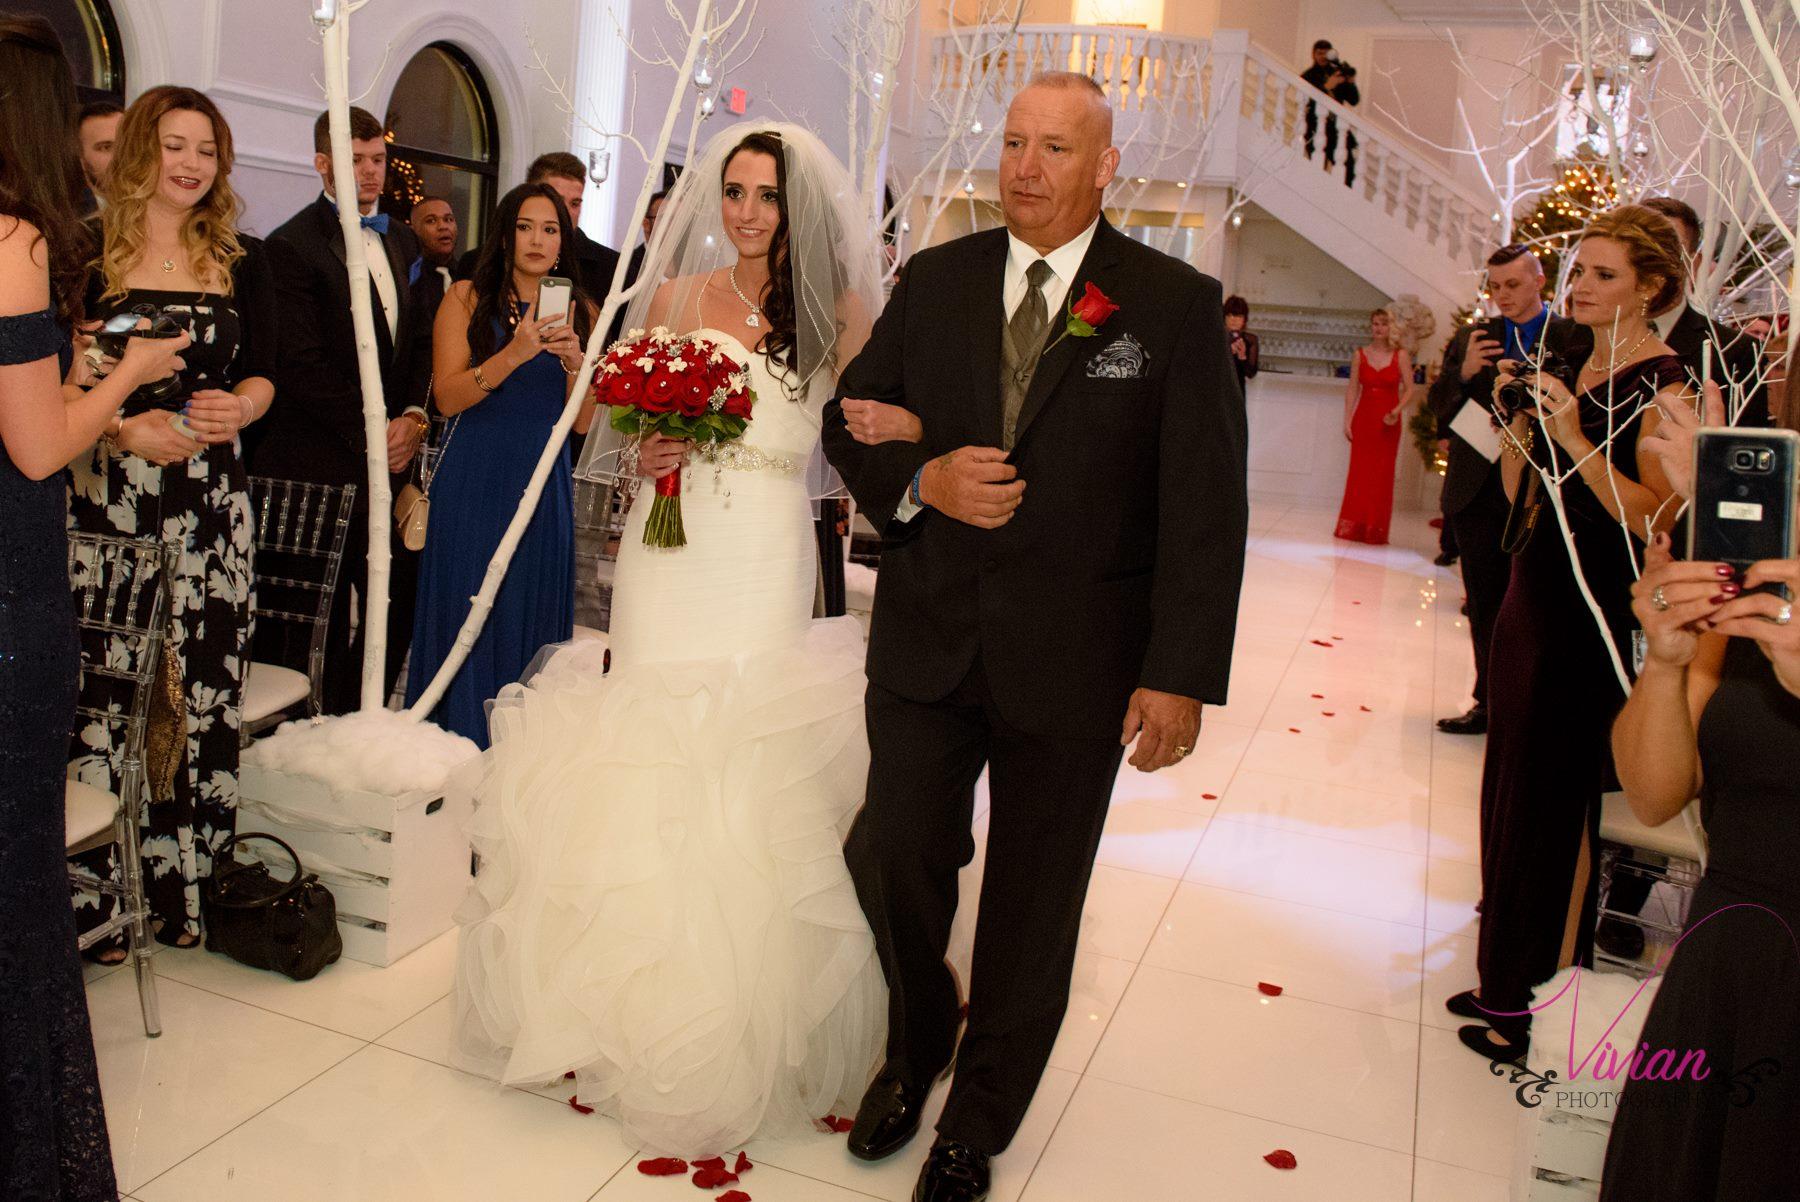 father-walking-bride-down-aisle.jpg